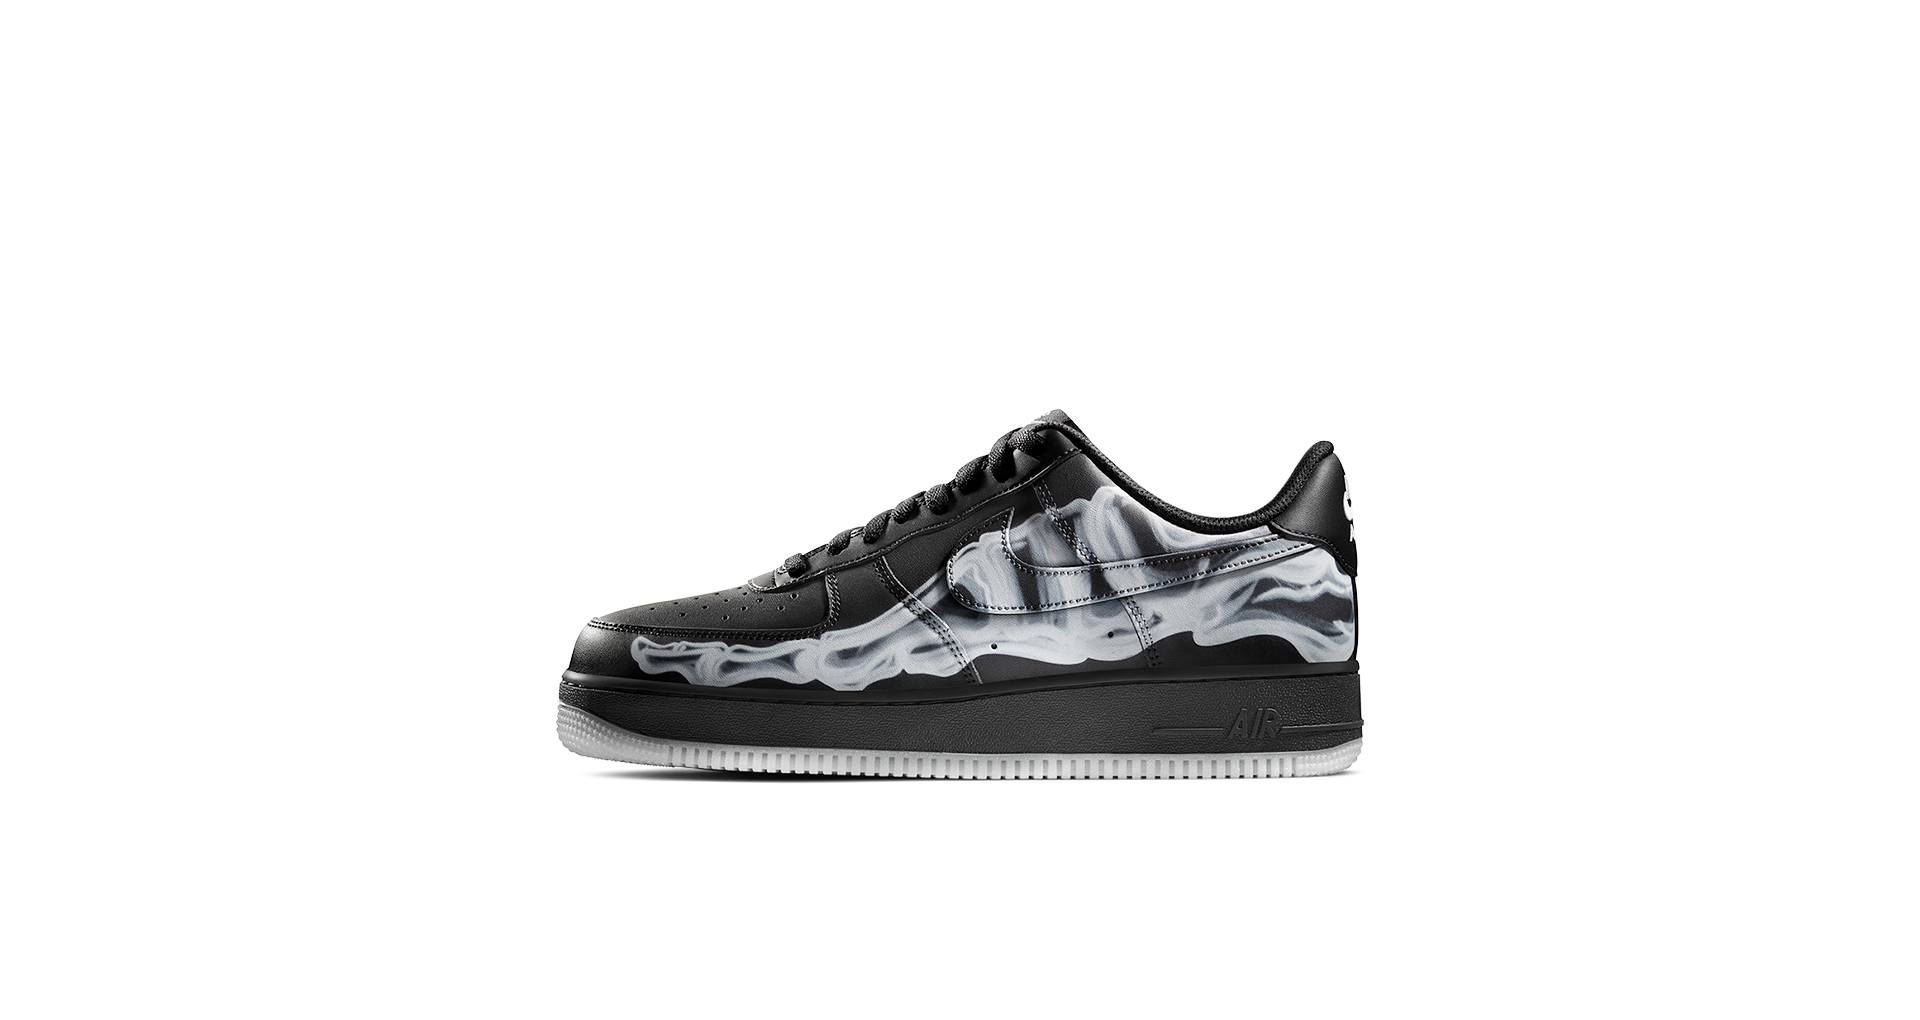 Air Force 1 Skeleton 'Black' Release Date. Nike SNKRS